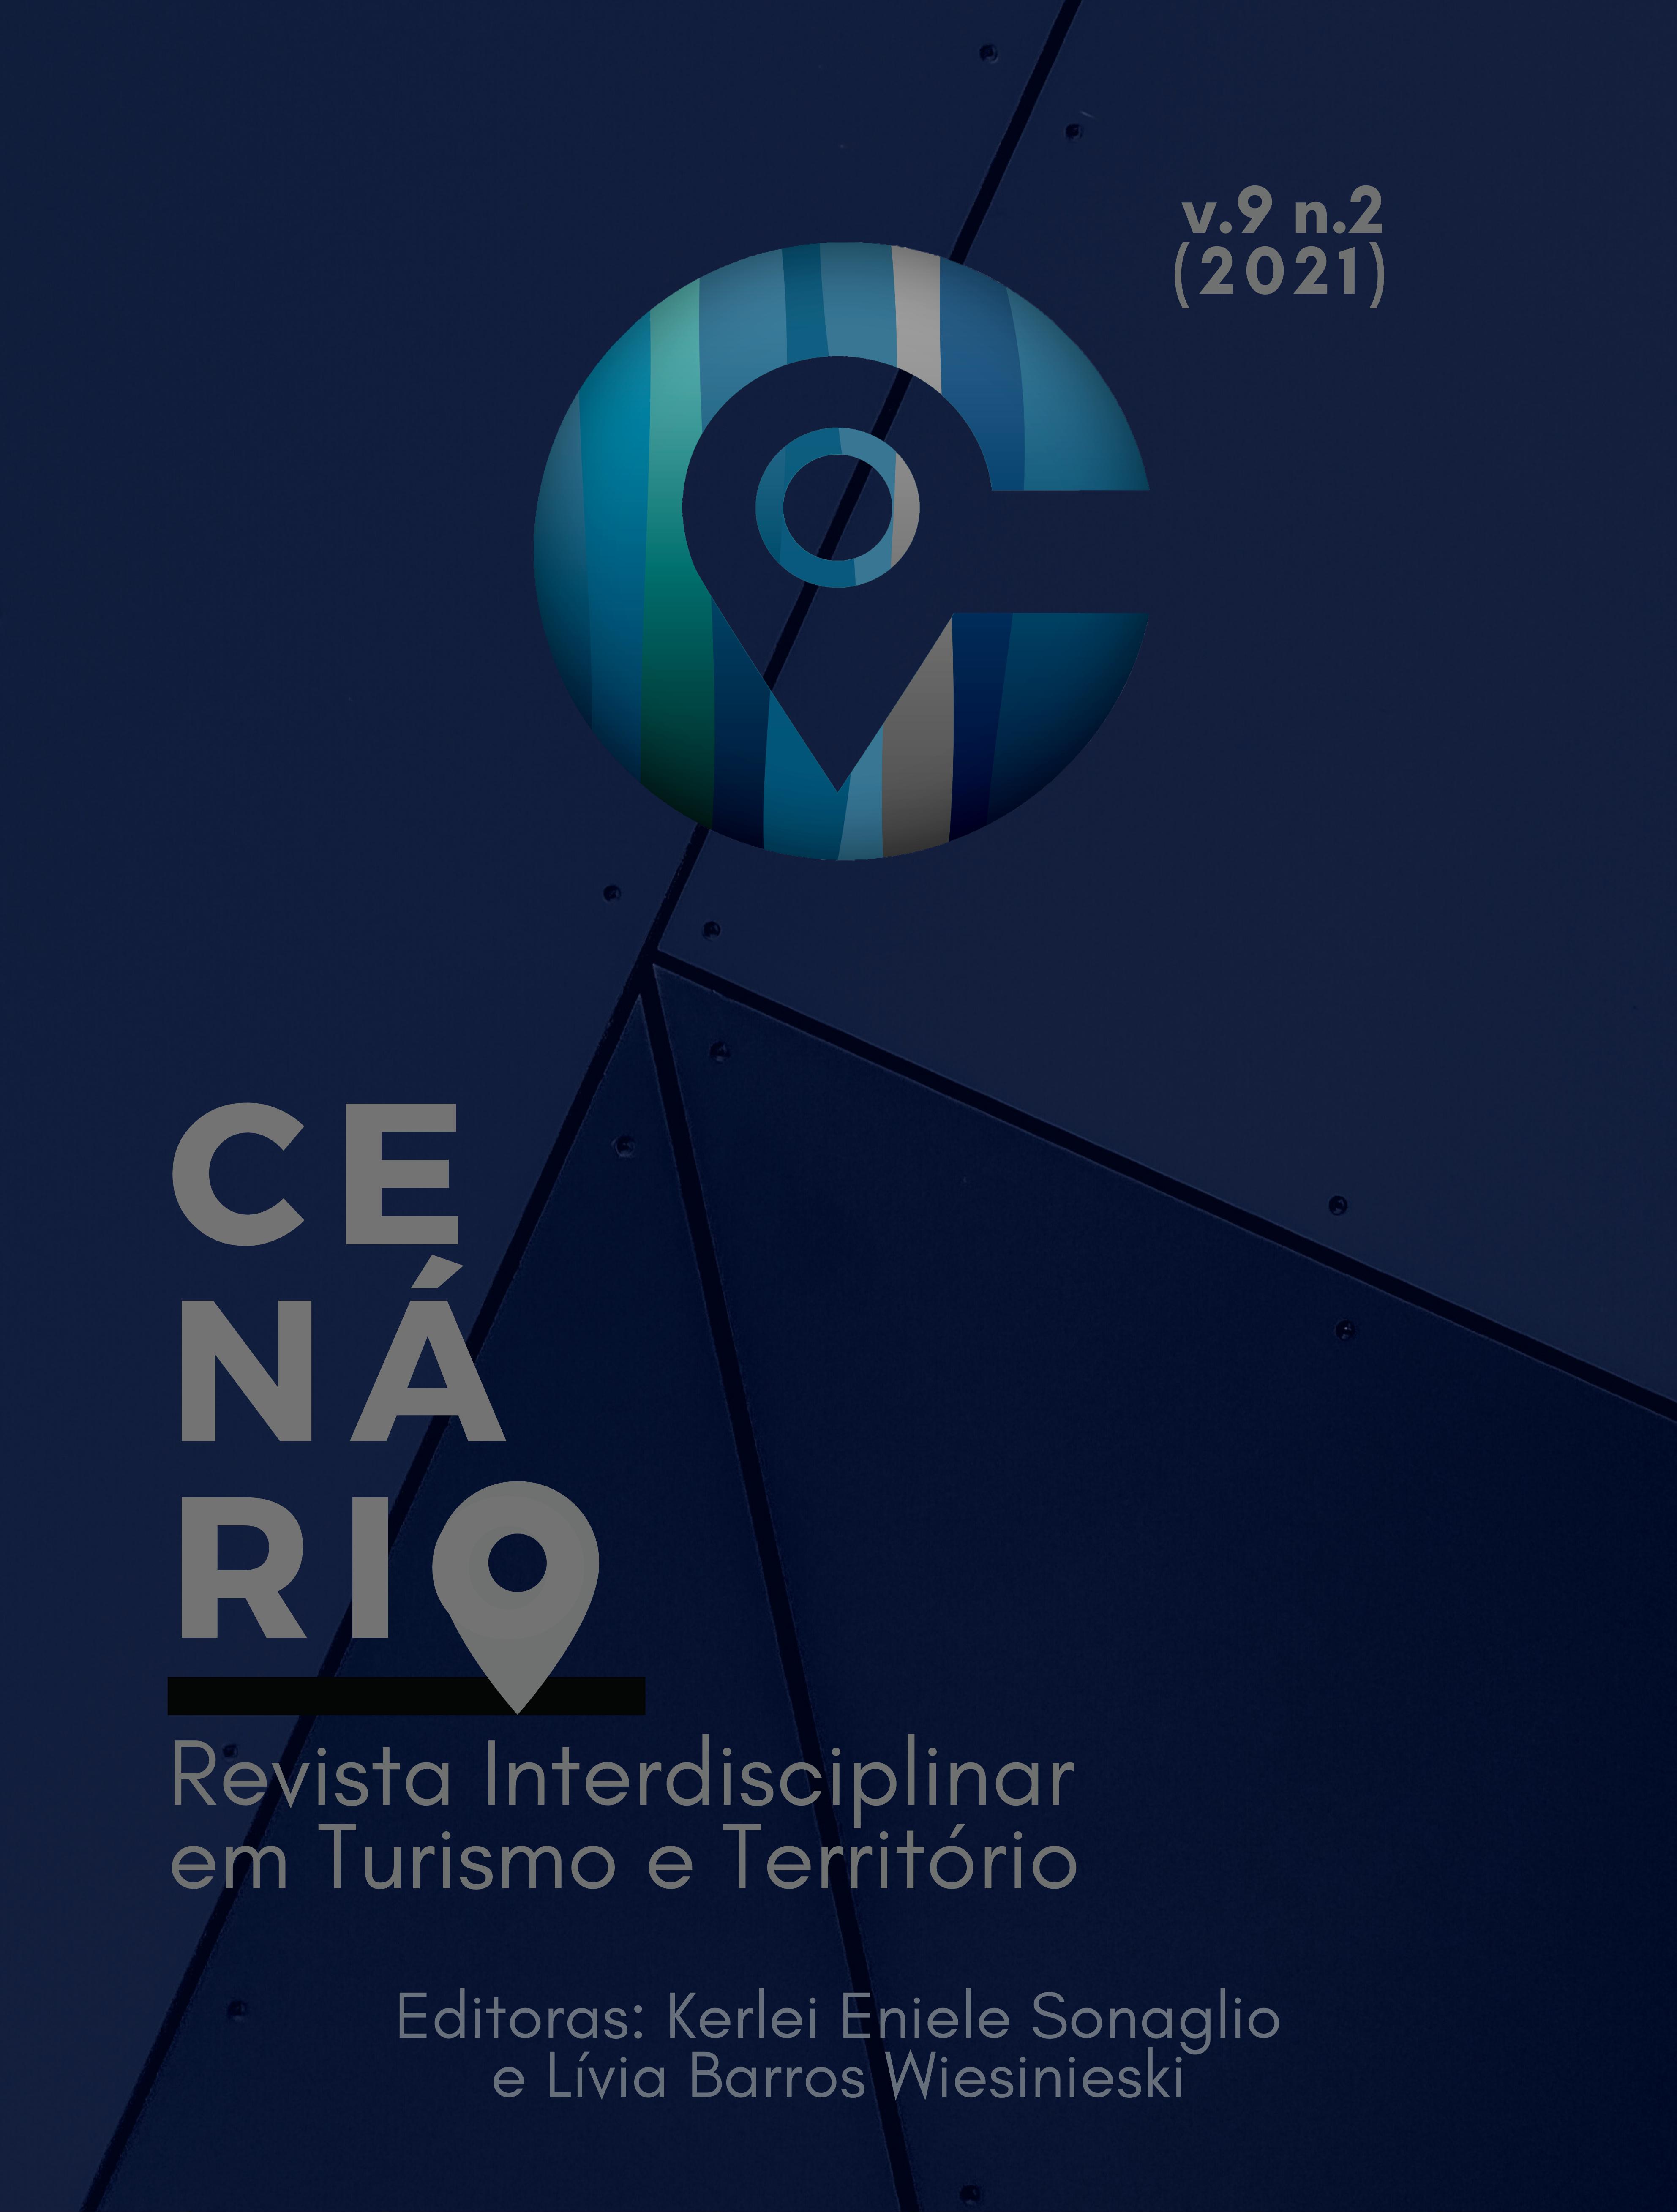 Visualizar v. 9 n. 2 (2021)